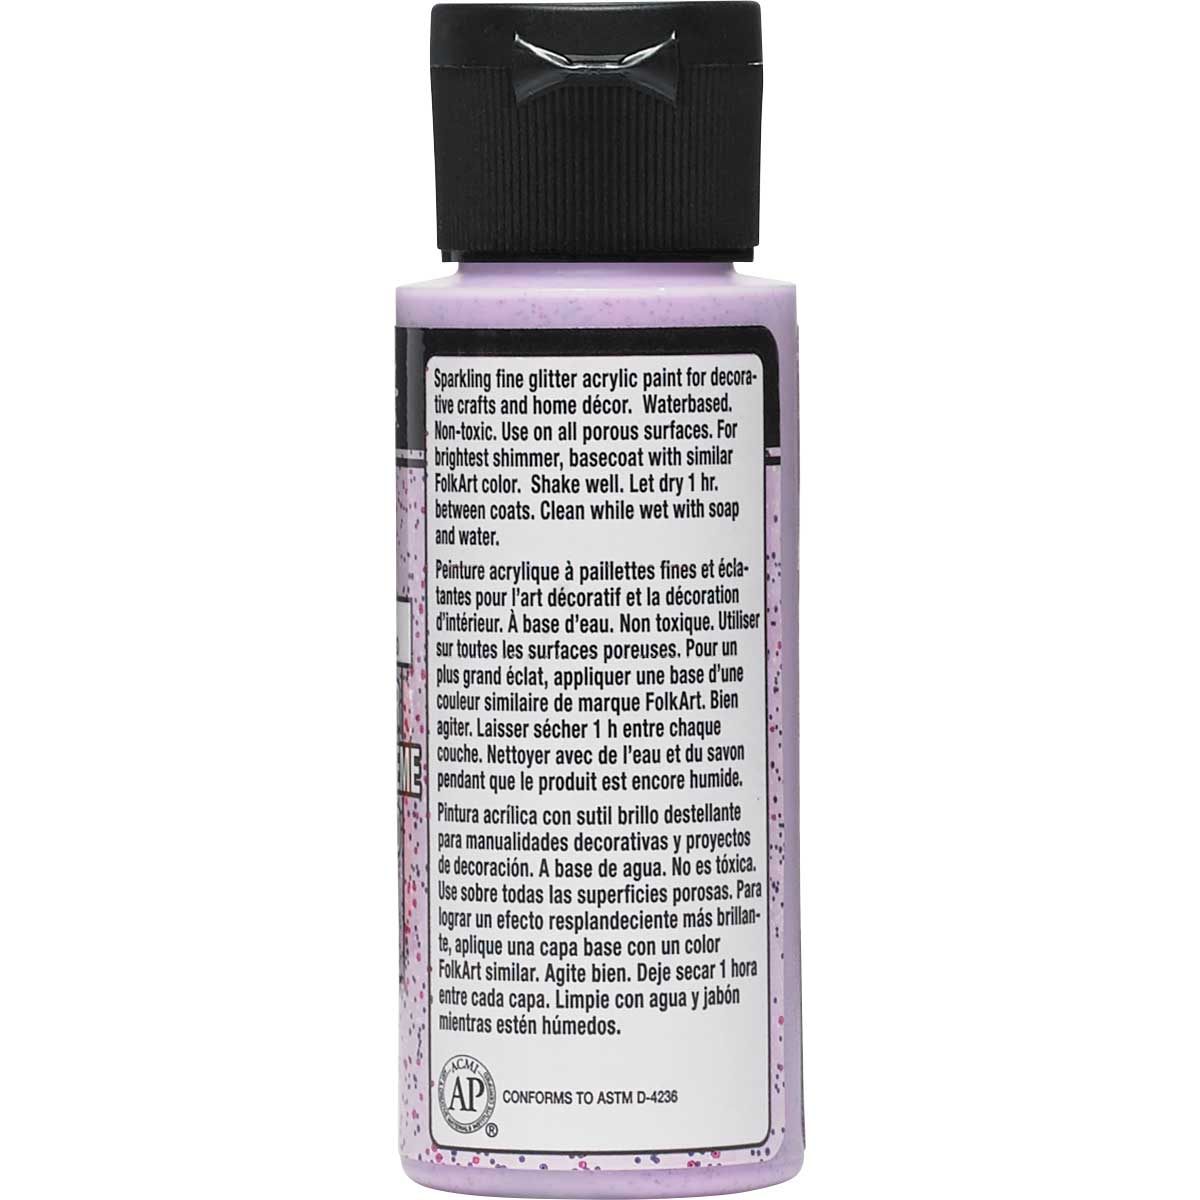 FolkArt ® Extreme Glitter™ - Fiery Fuchsia, 2 oz. - 2829